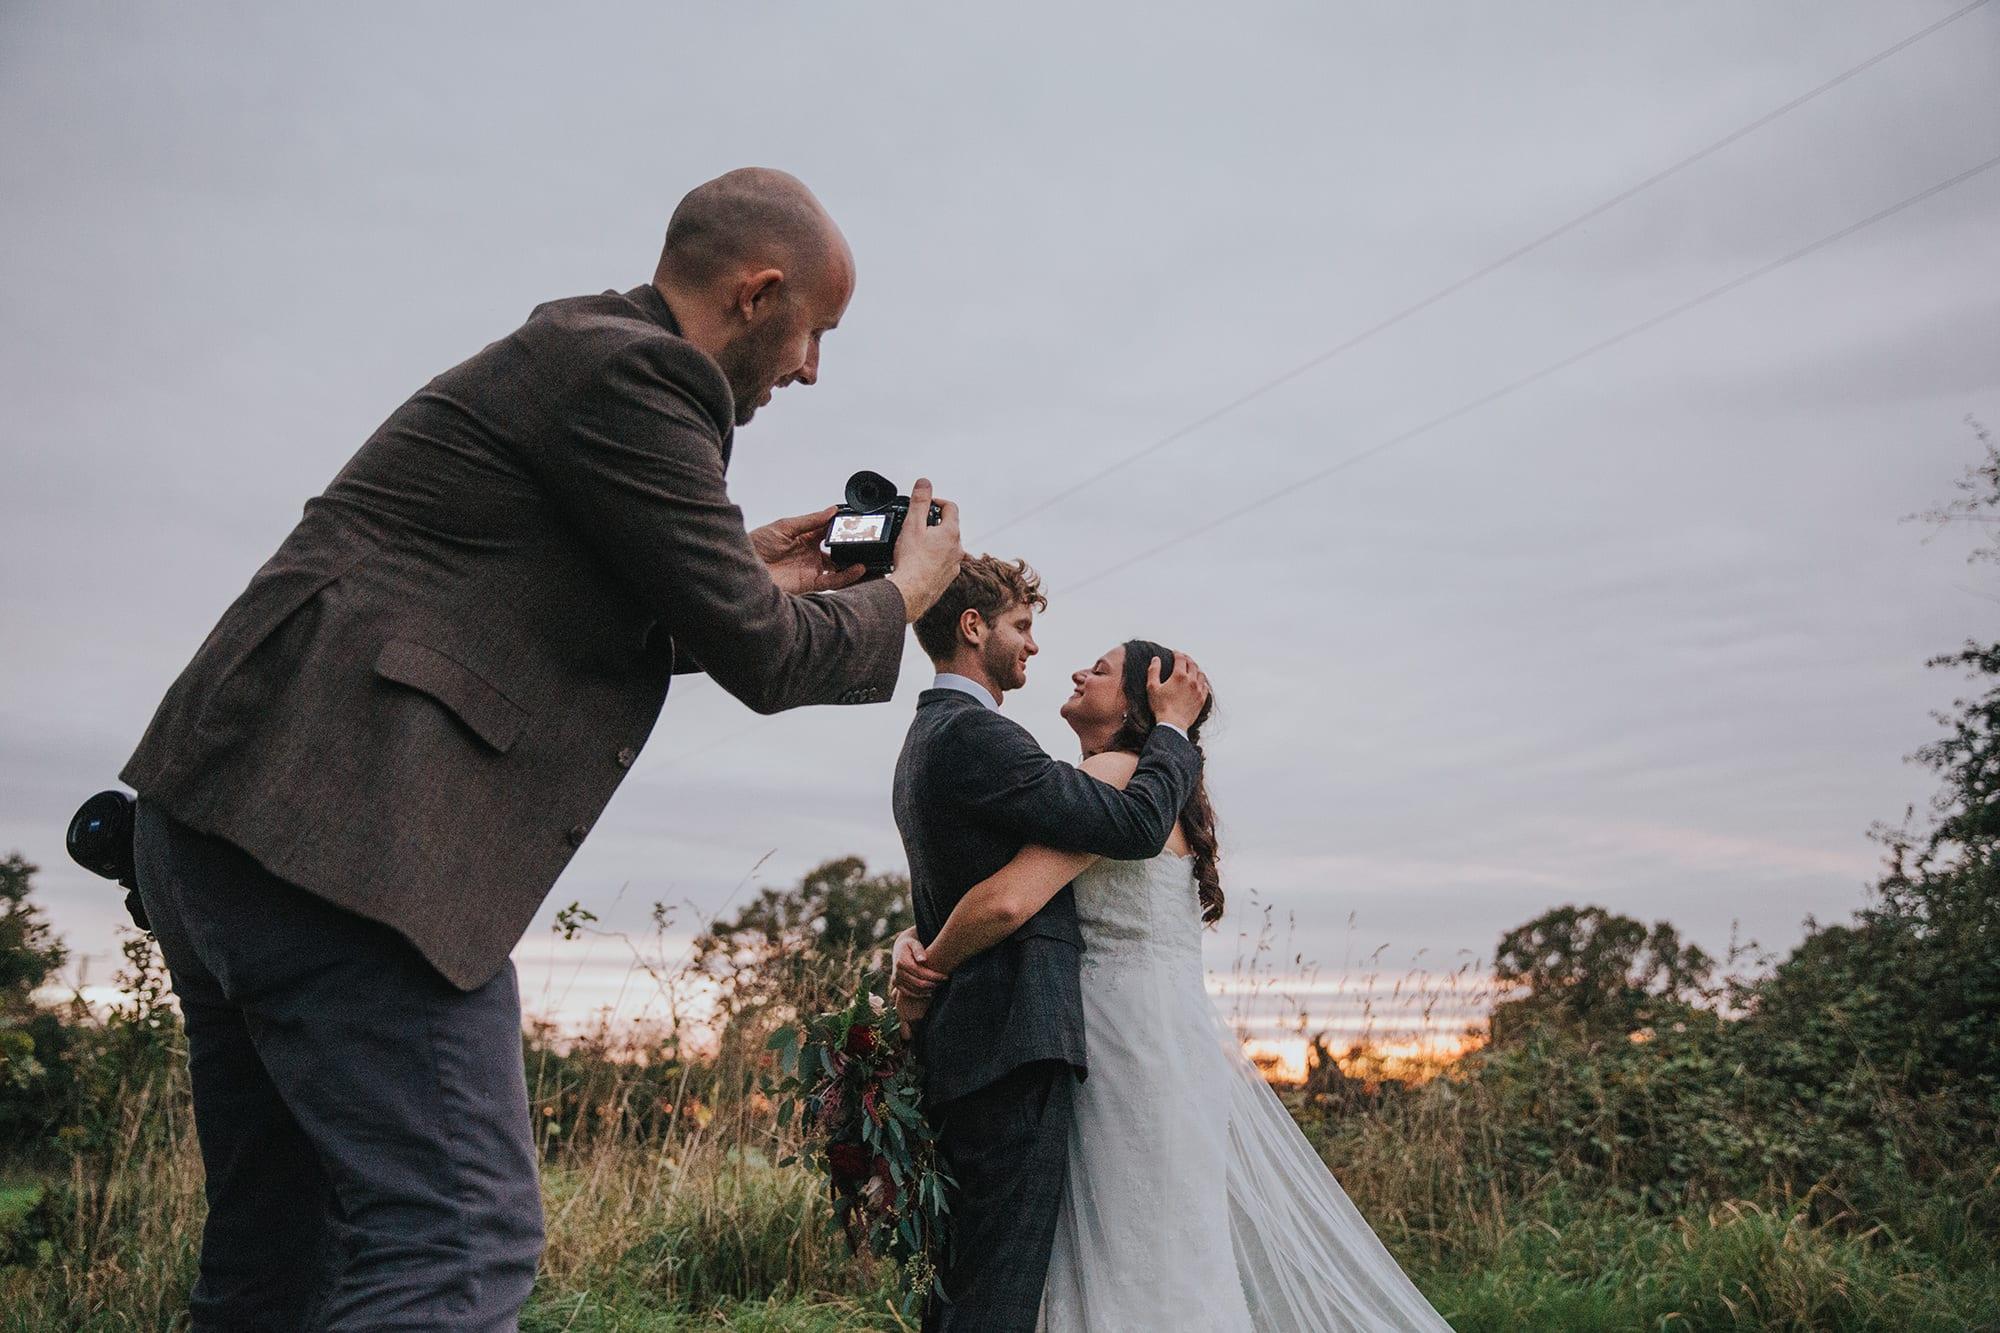 Norfolk Wedding Videographer Equipment